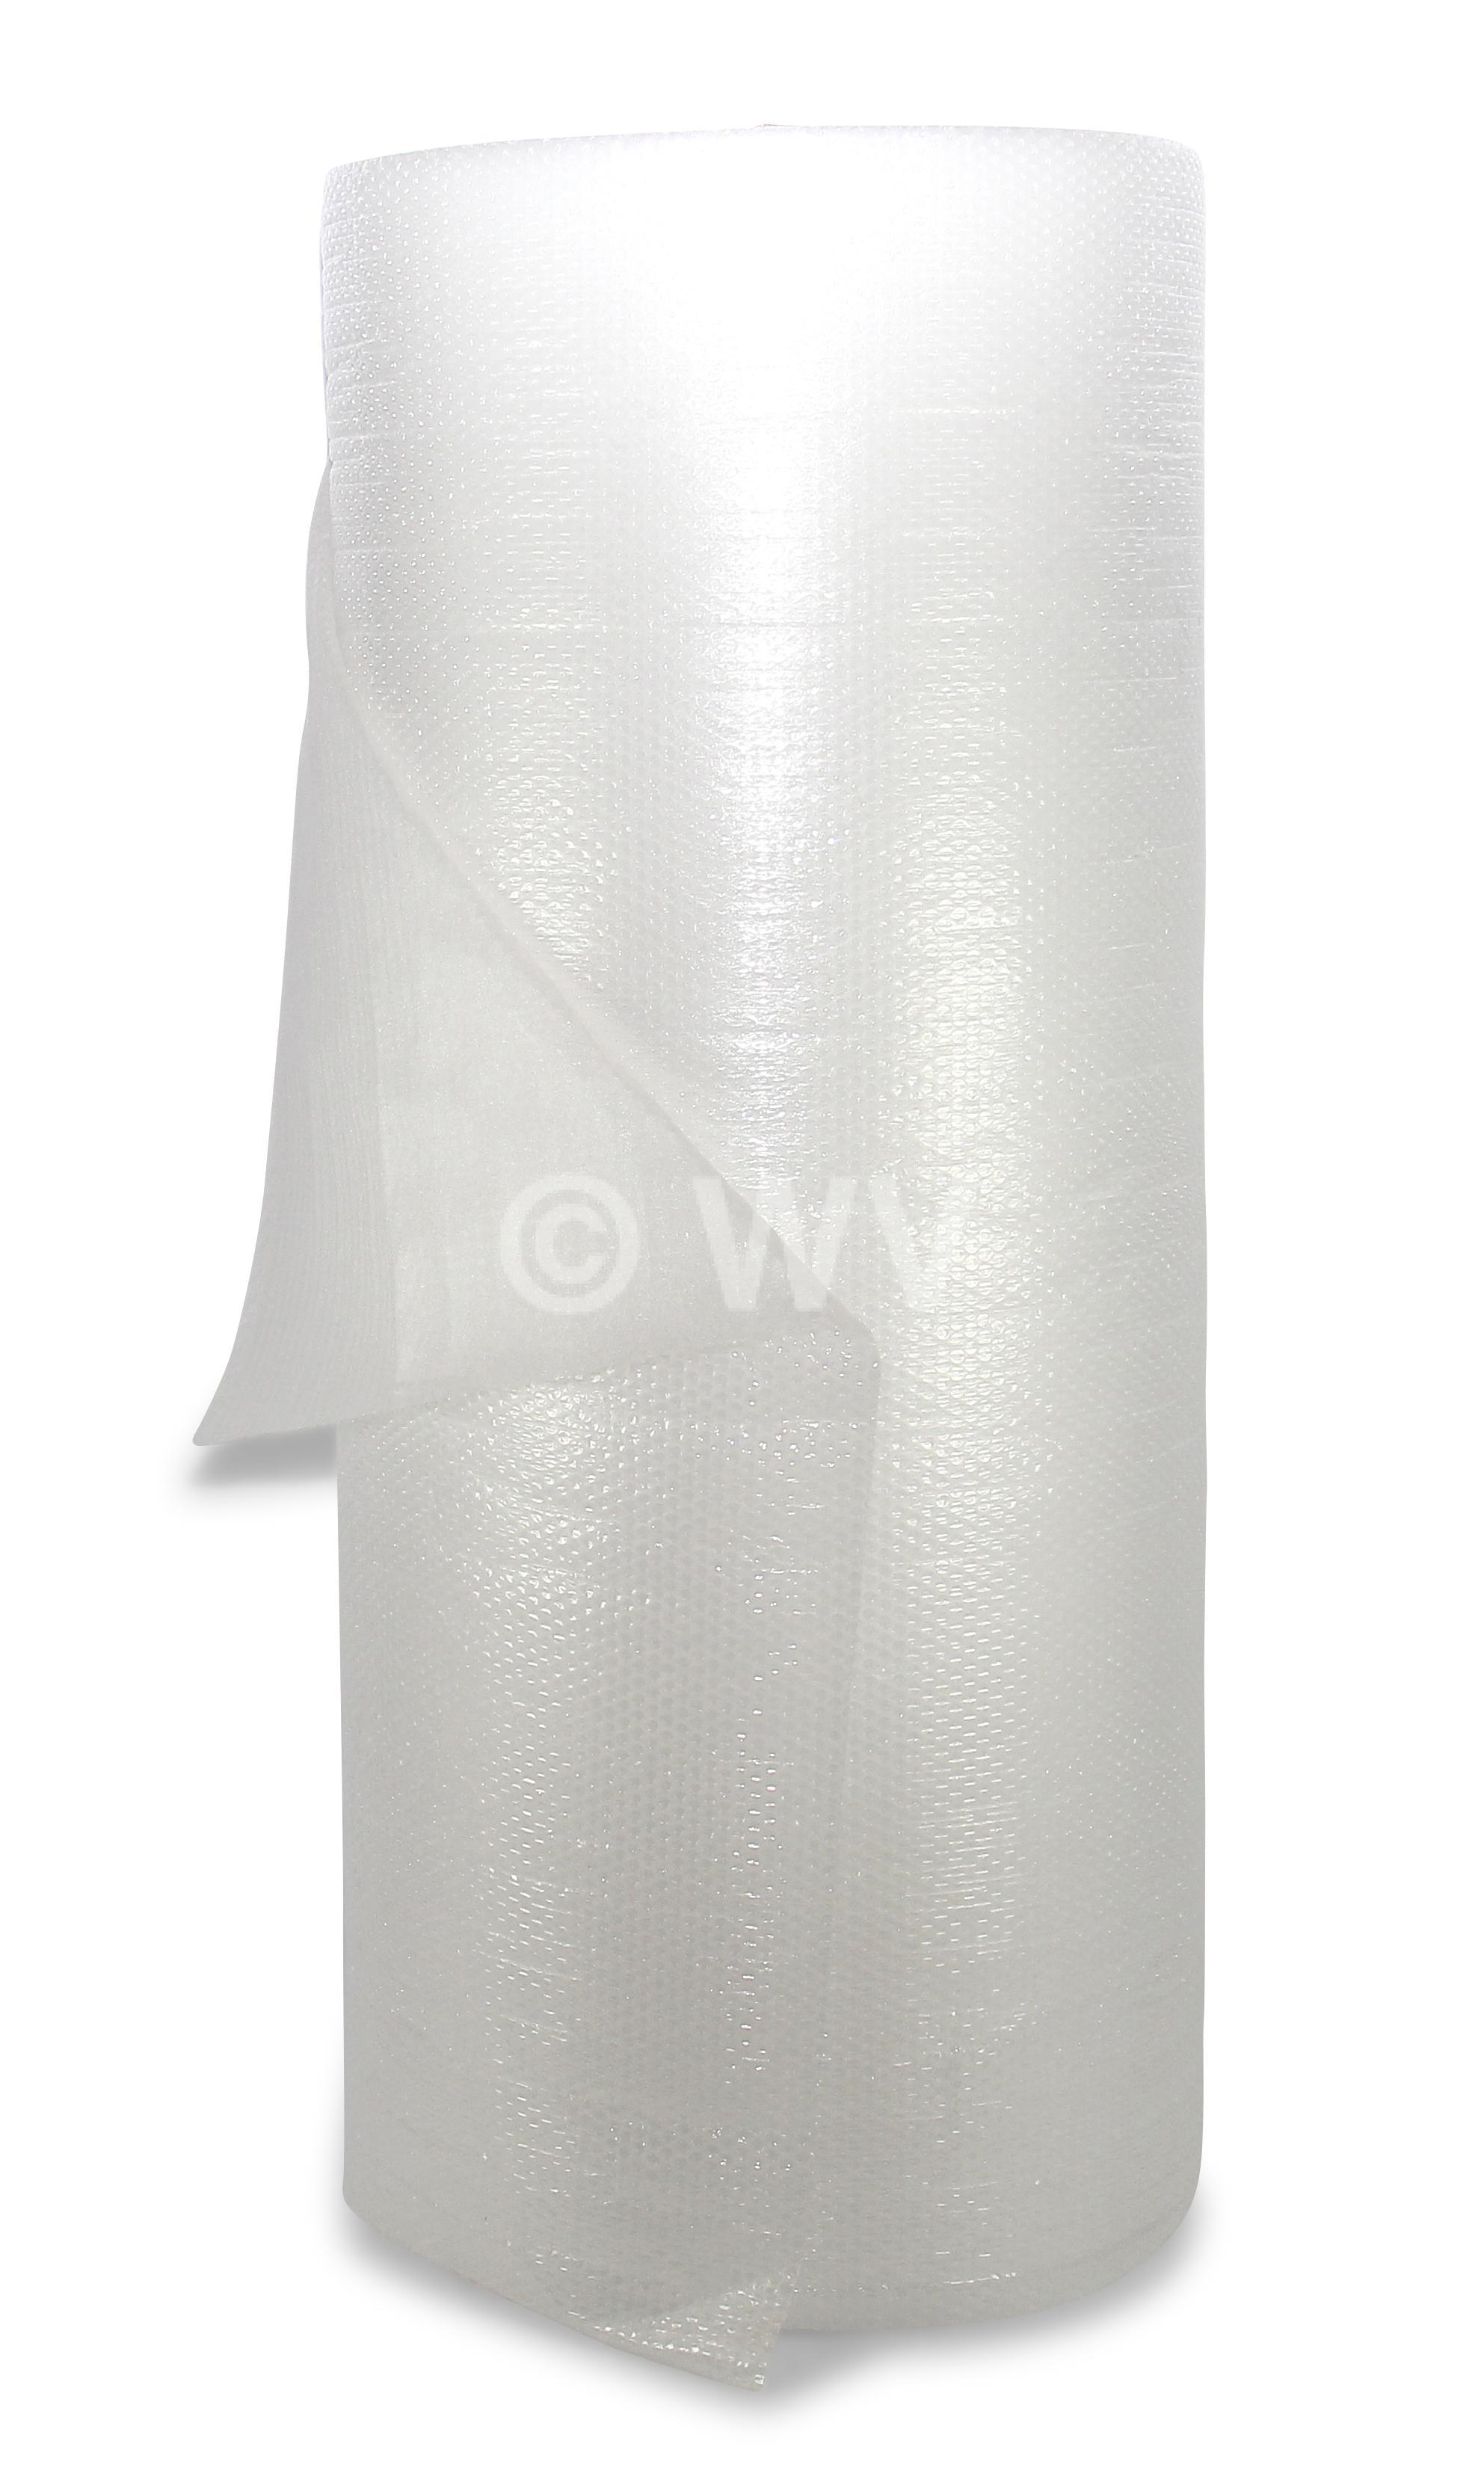 luftpolsterfolie rolle transparent vlieskaschiert 120 cm x 50 m 80 3 lagig 10mm noppe. Black Bedroom Furniture Sets. Home Design Ideas